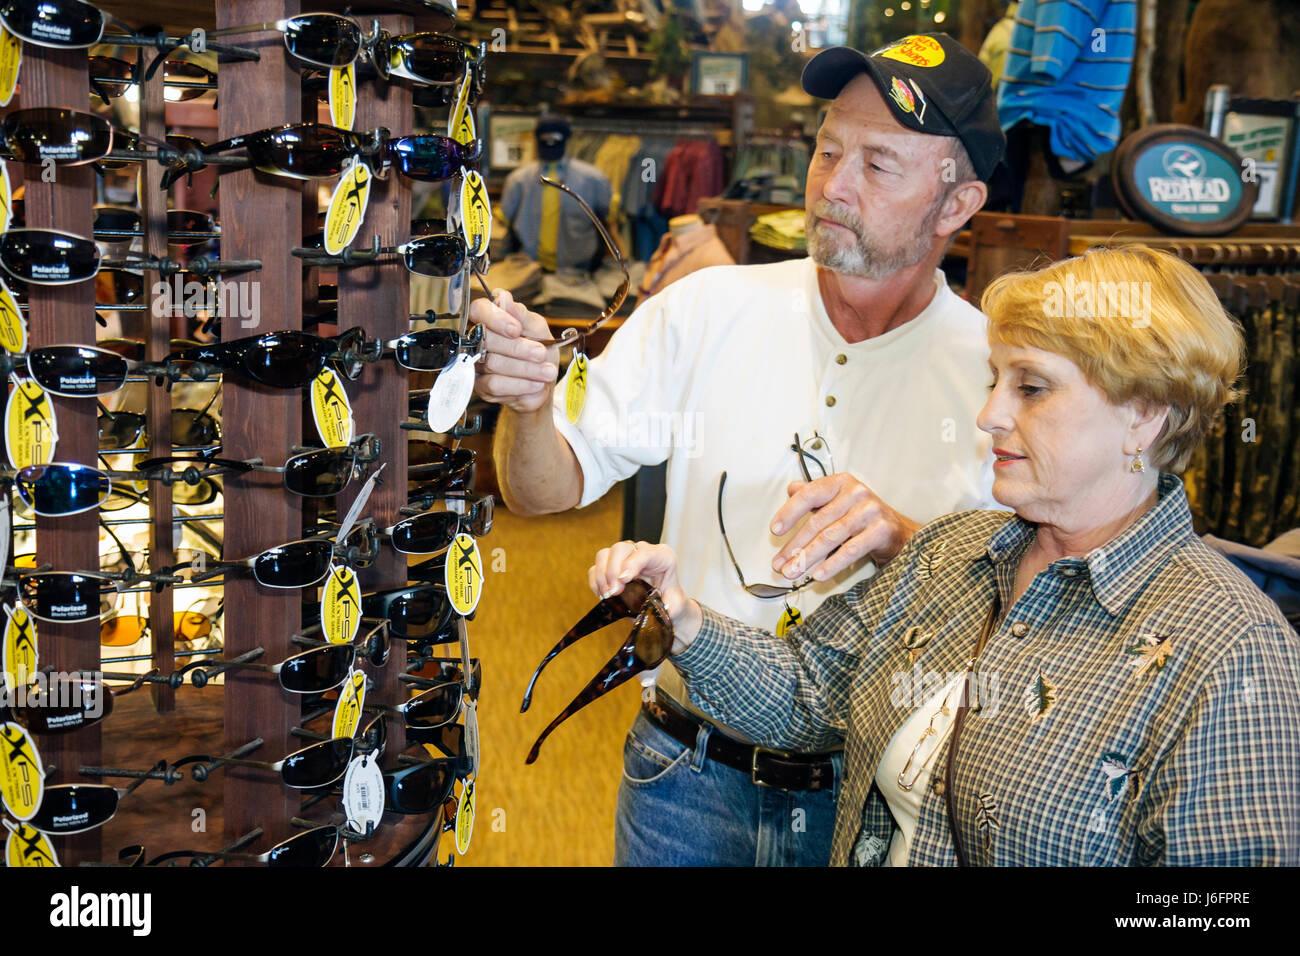 d2f0888c3c Tennessee Sevierville Kodak Bass Pro Shops man woman couple shopping  sunglasses merchandise sporting goods outdoor recreation su